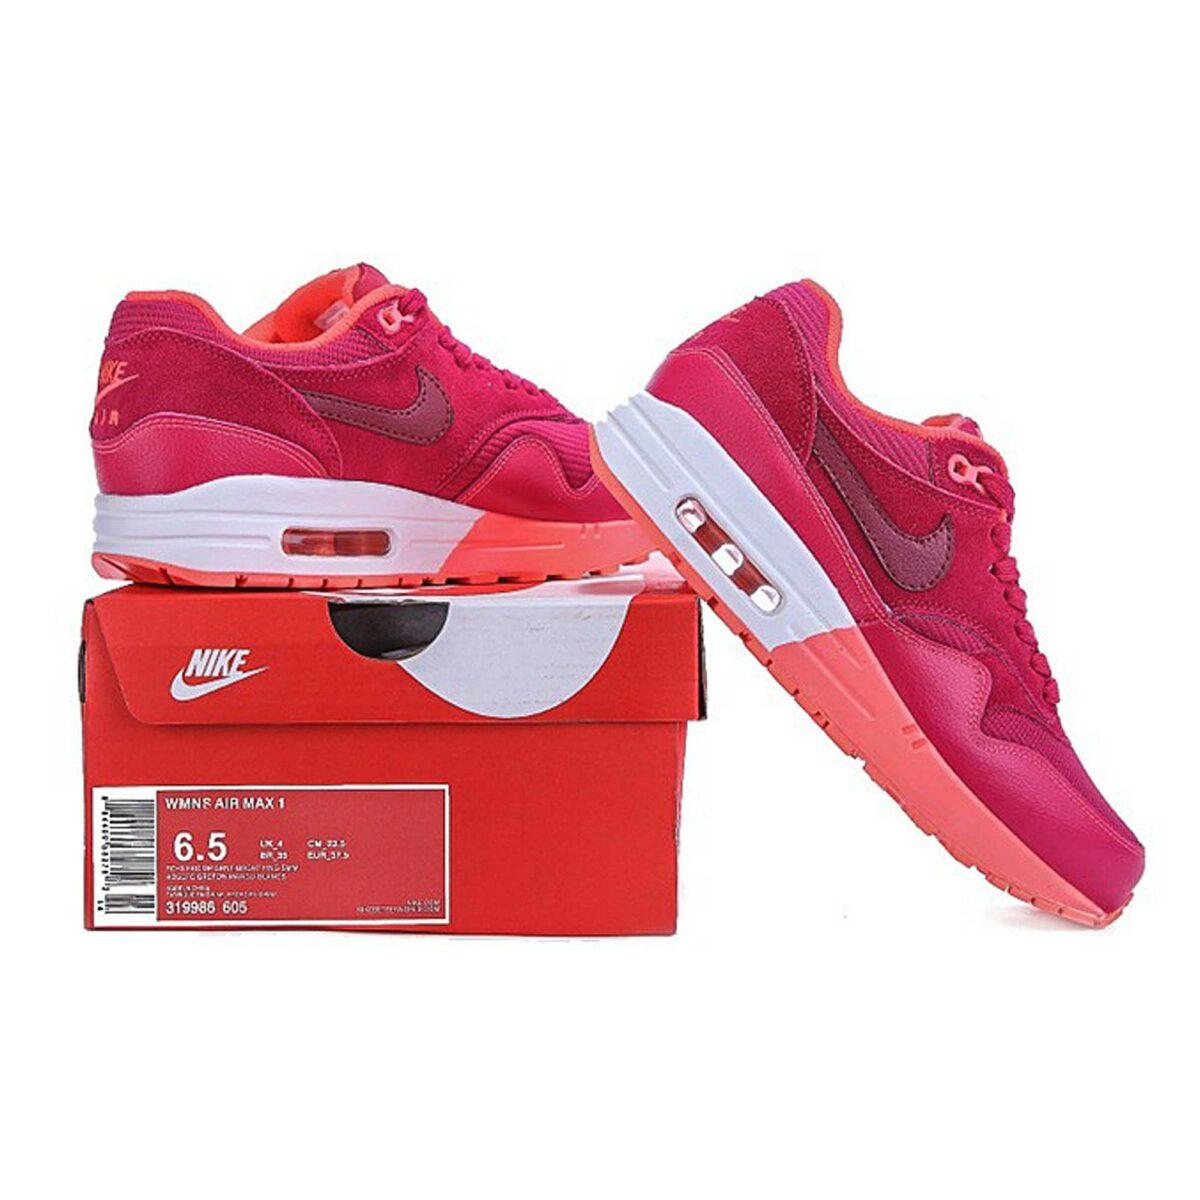 Интернет магазин Nike Air Max 1 87 Premium Deep Garnet